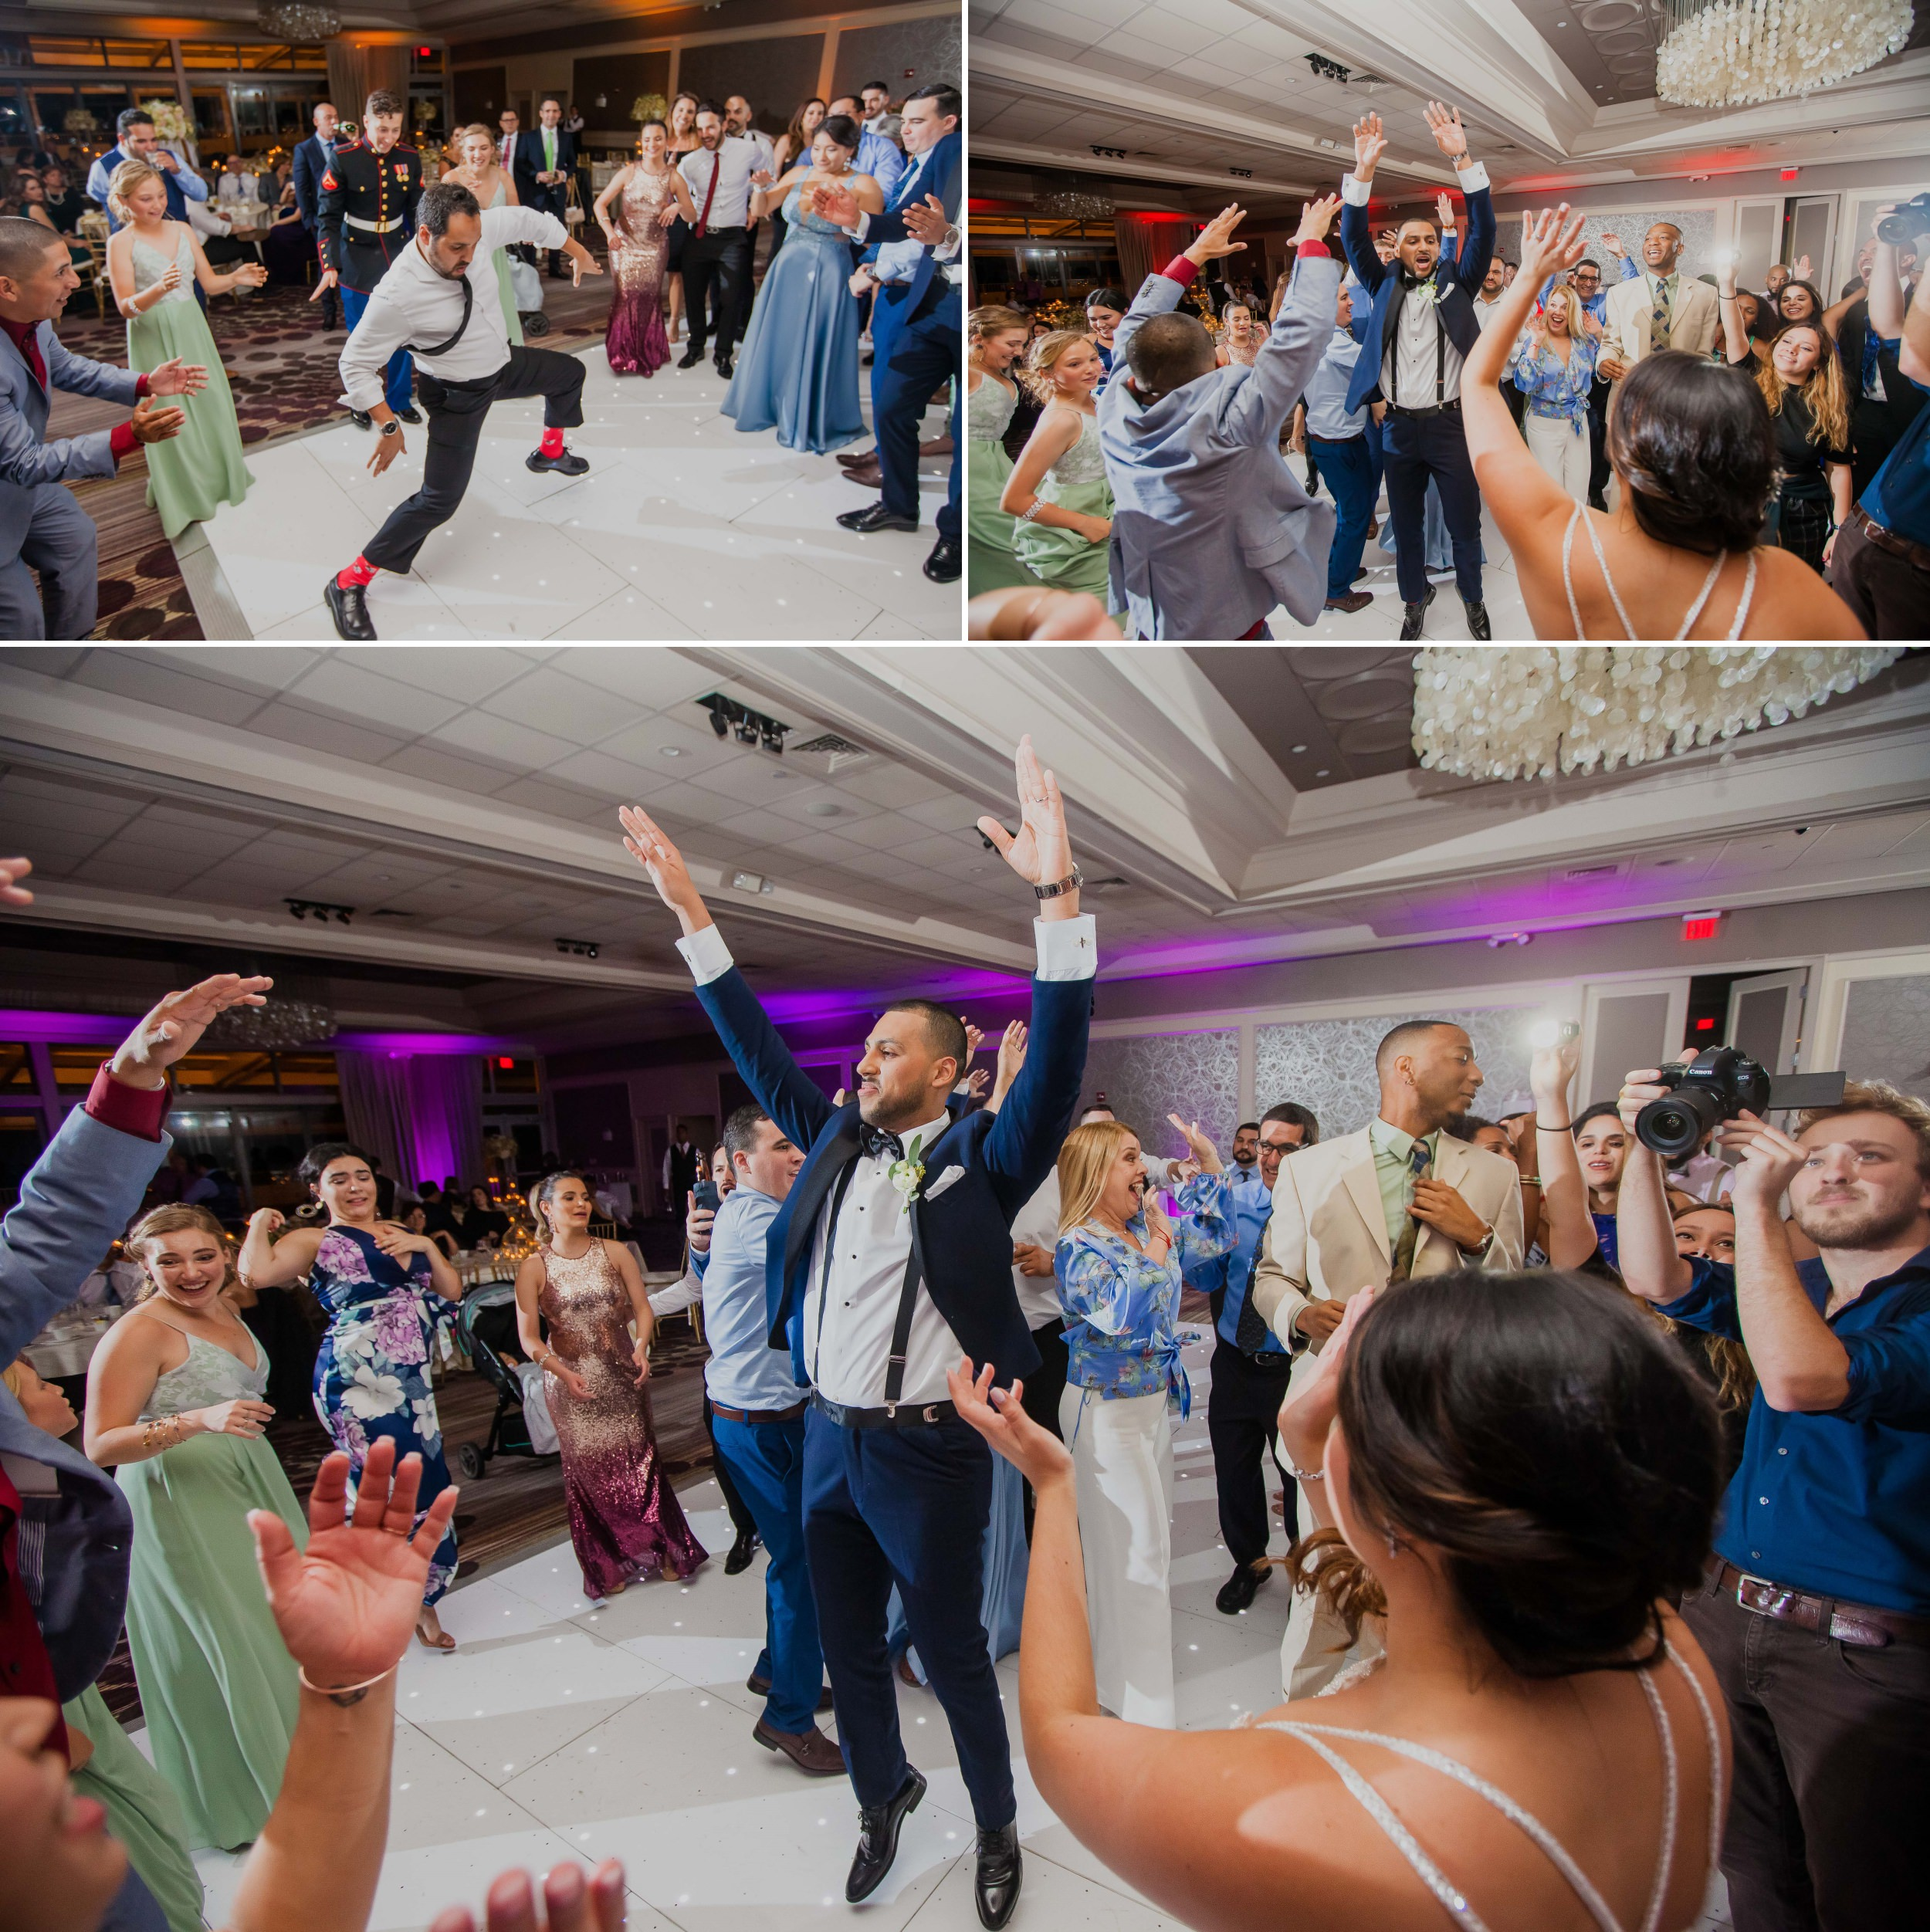 Wedding - Rusty Pelican - Key Biscayne - Santy Martinez Photography 46.jpg